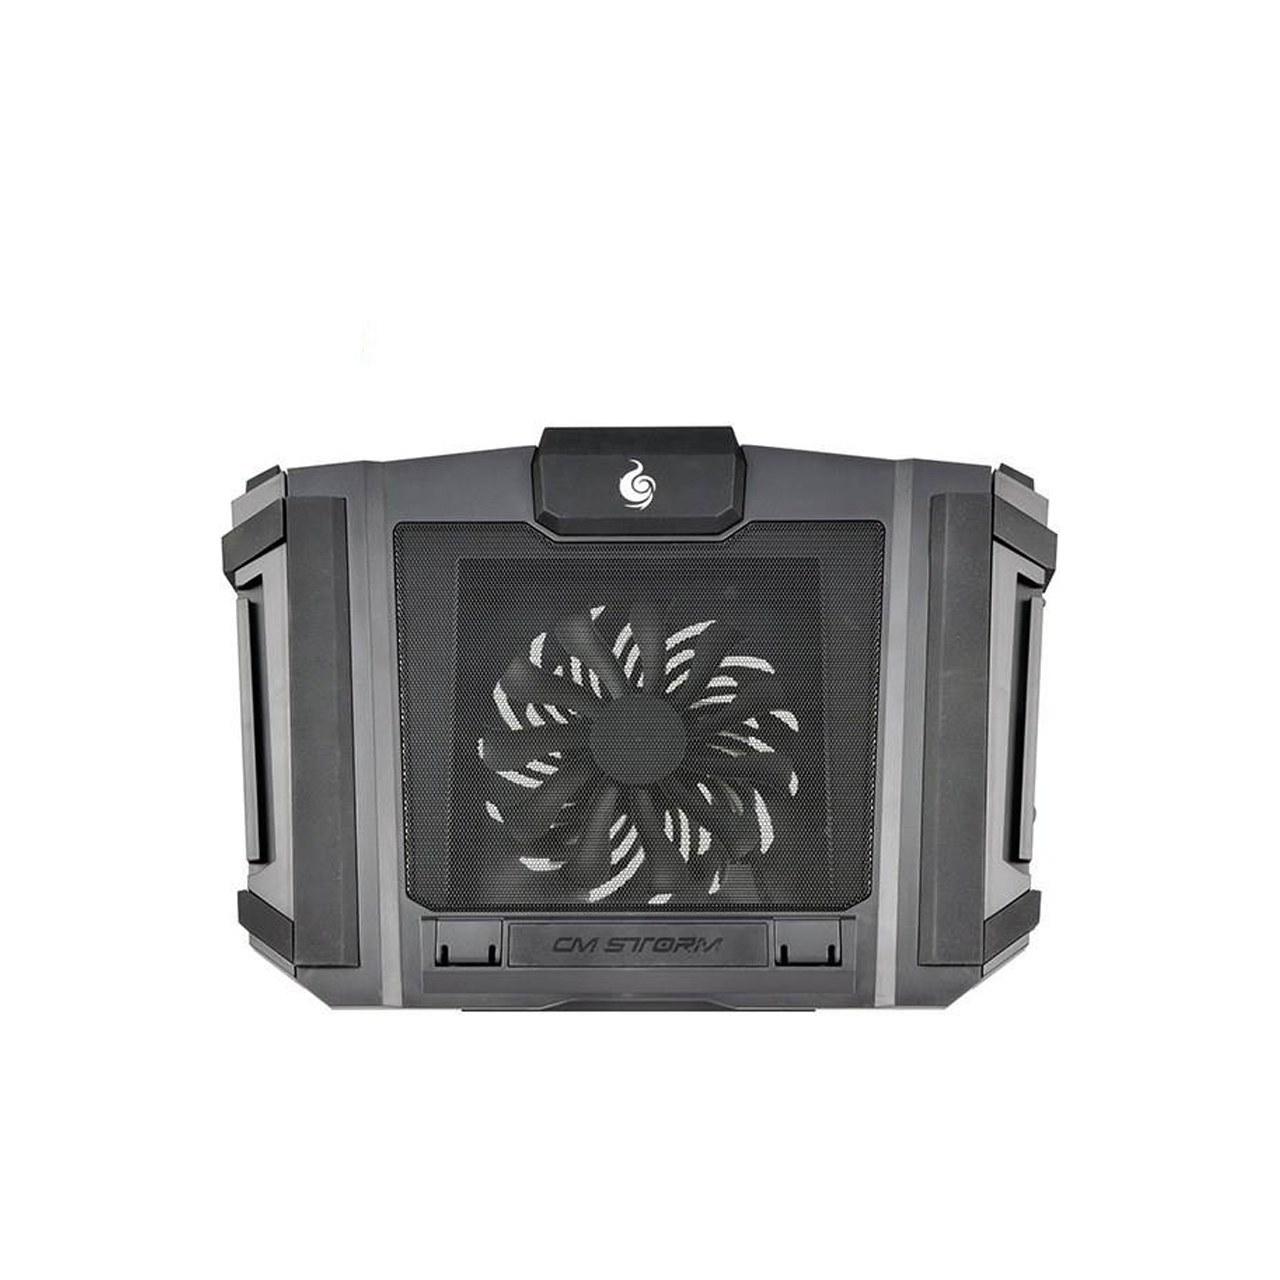 تصویر پایه خنک کننده لپ تاپ کولر مستر مدل COOLER MASTER NOTEPAL SF-17 Cooler Master NOTEPAL sf-17 Coolpad